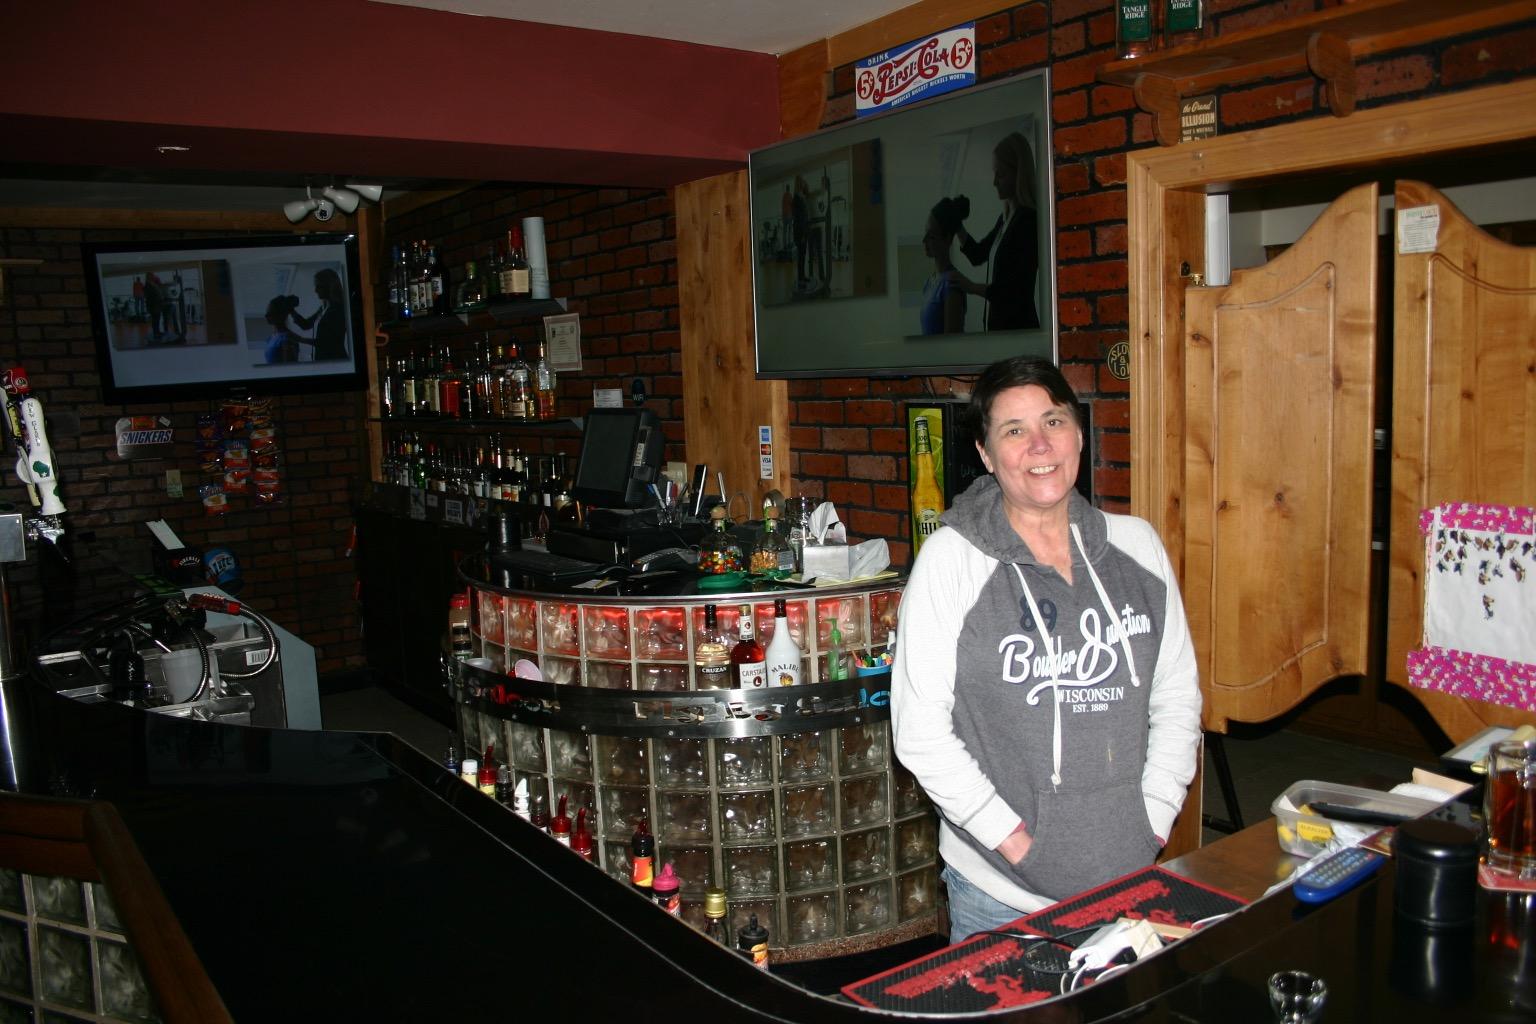 Debbie Dean behind the bar at Neighborhood Bar. Photo courtesy of Warren Johnston.